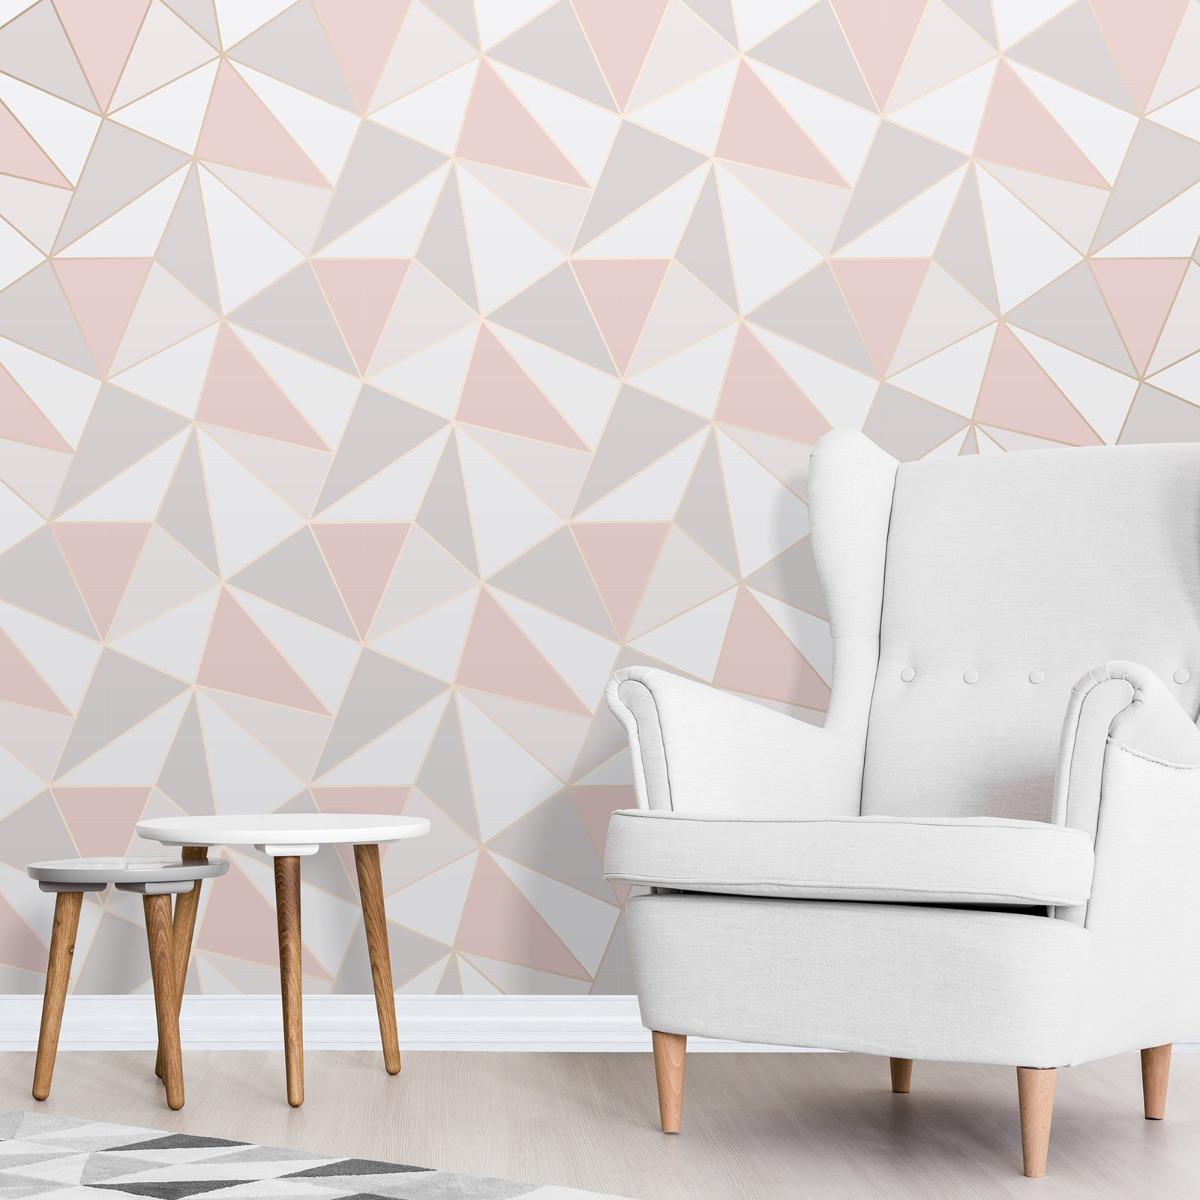 Apex Geometric Wallpaper Rose Gold Fine Decor